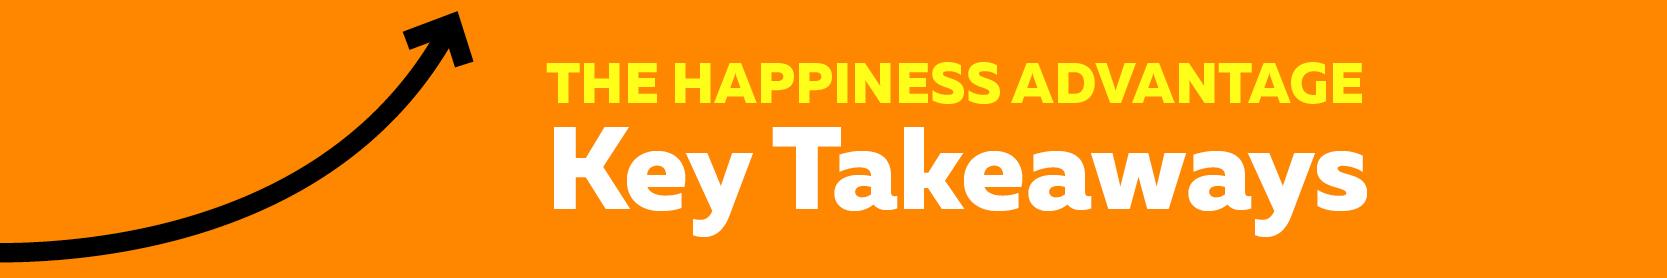 Happiness Advantage Key Takeaways – Goodthink Inc.